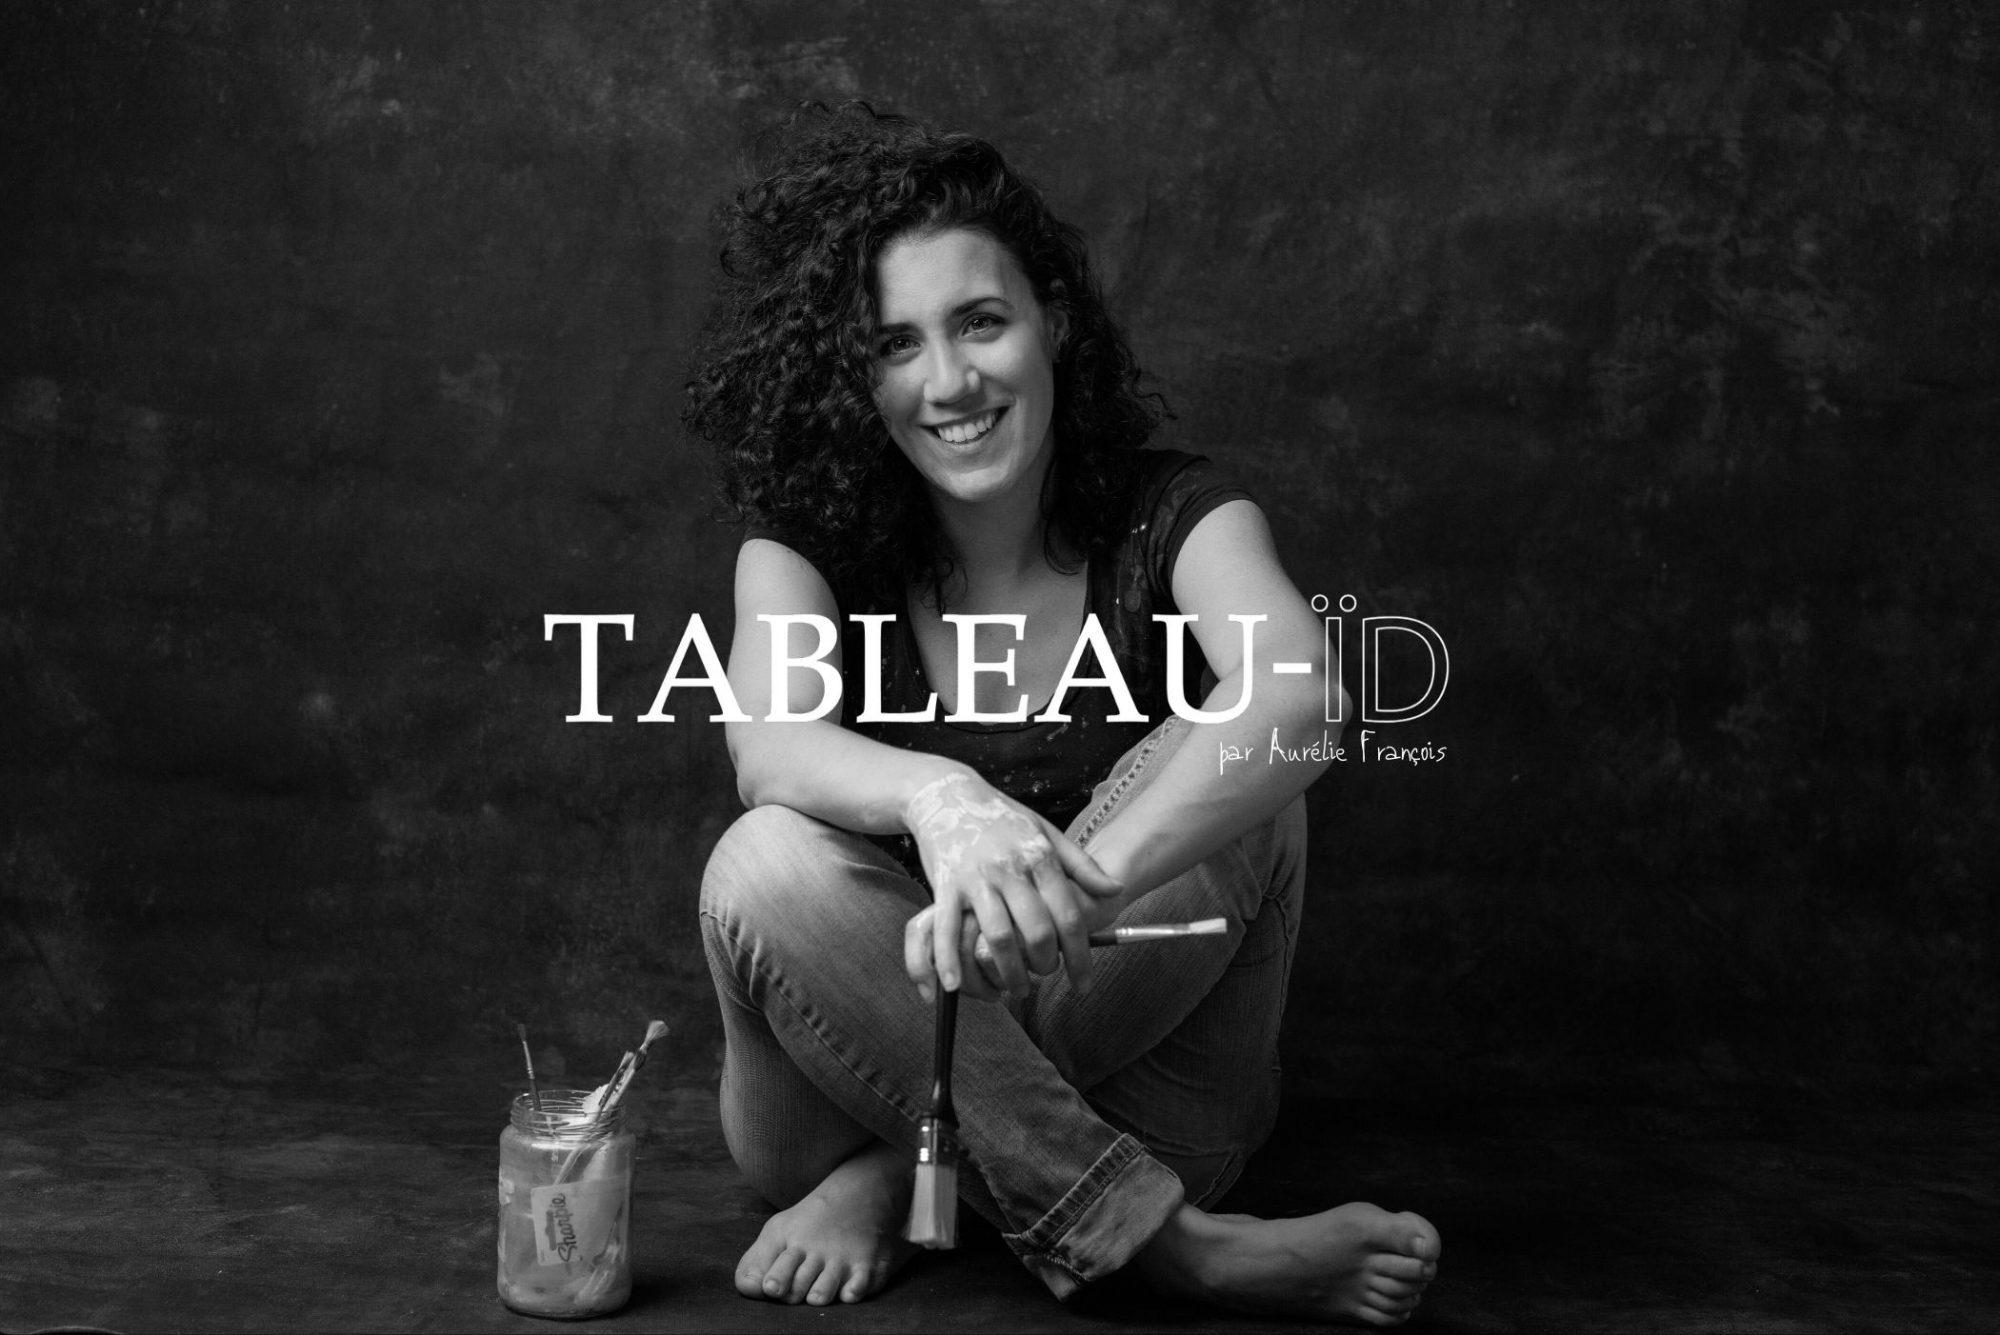 TABLEAU-ÏD